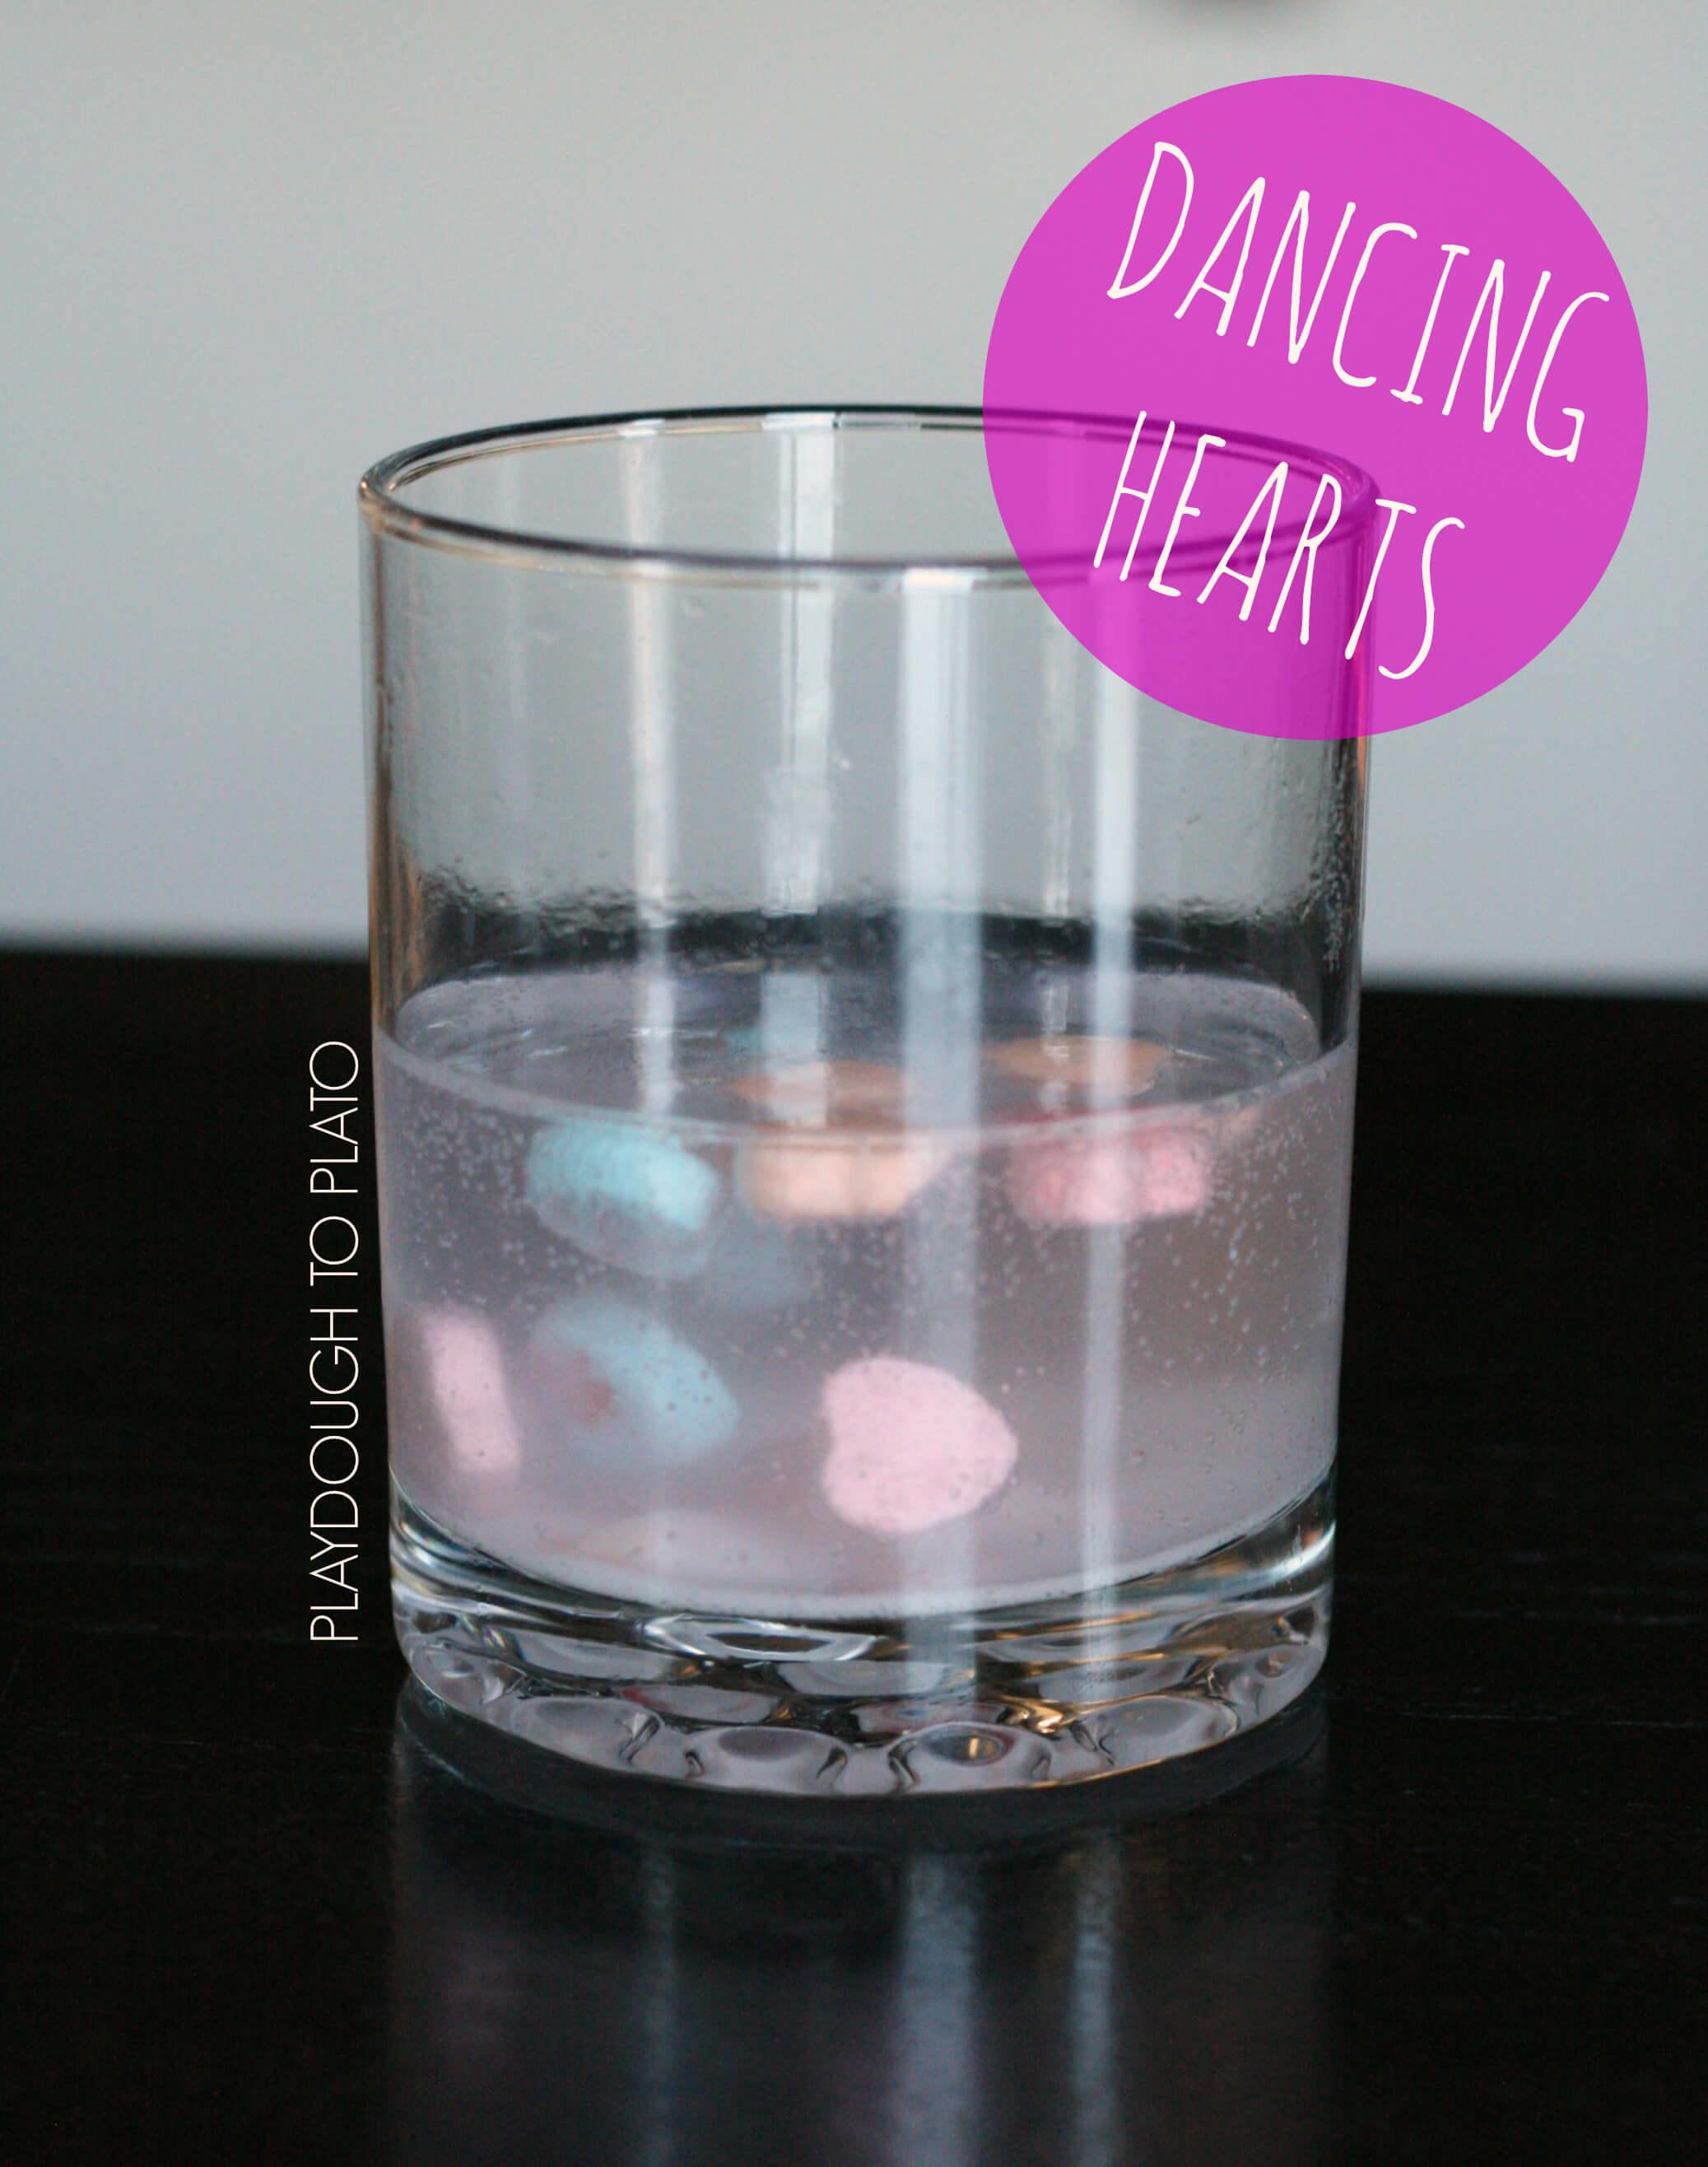 Dancing Conversation Hearts